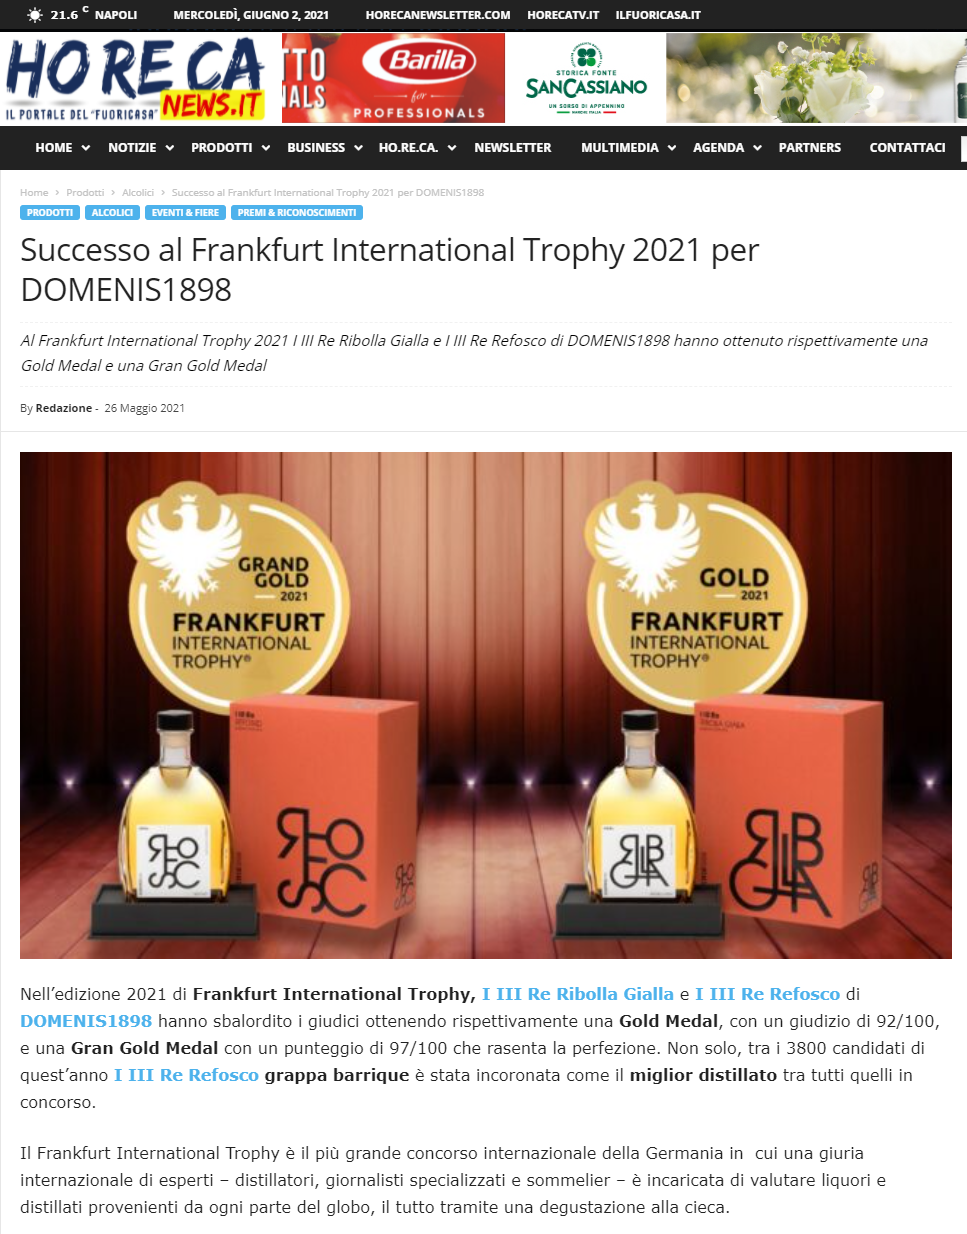 2021 maggio 26: Horecanews.it – Successo al Frankfurt International Trophy 2021 per DOMENIS1898